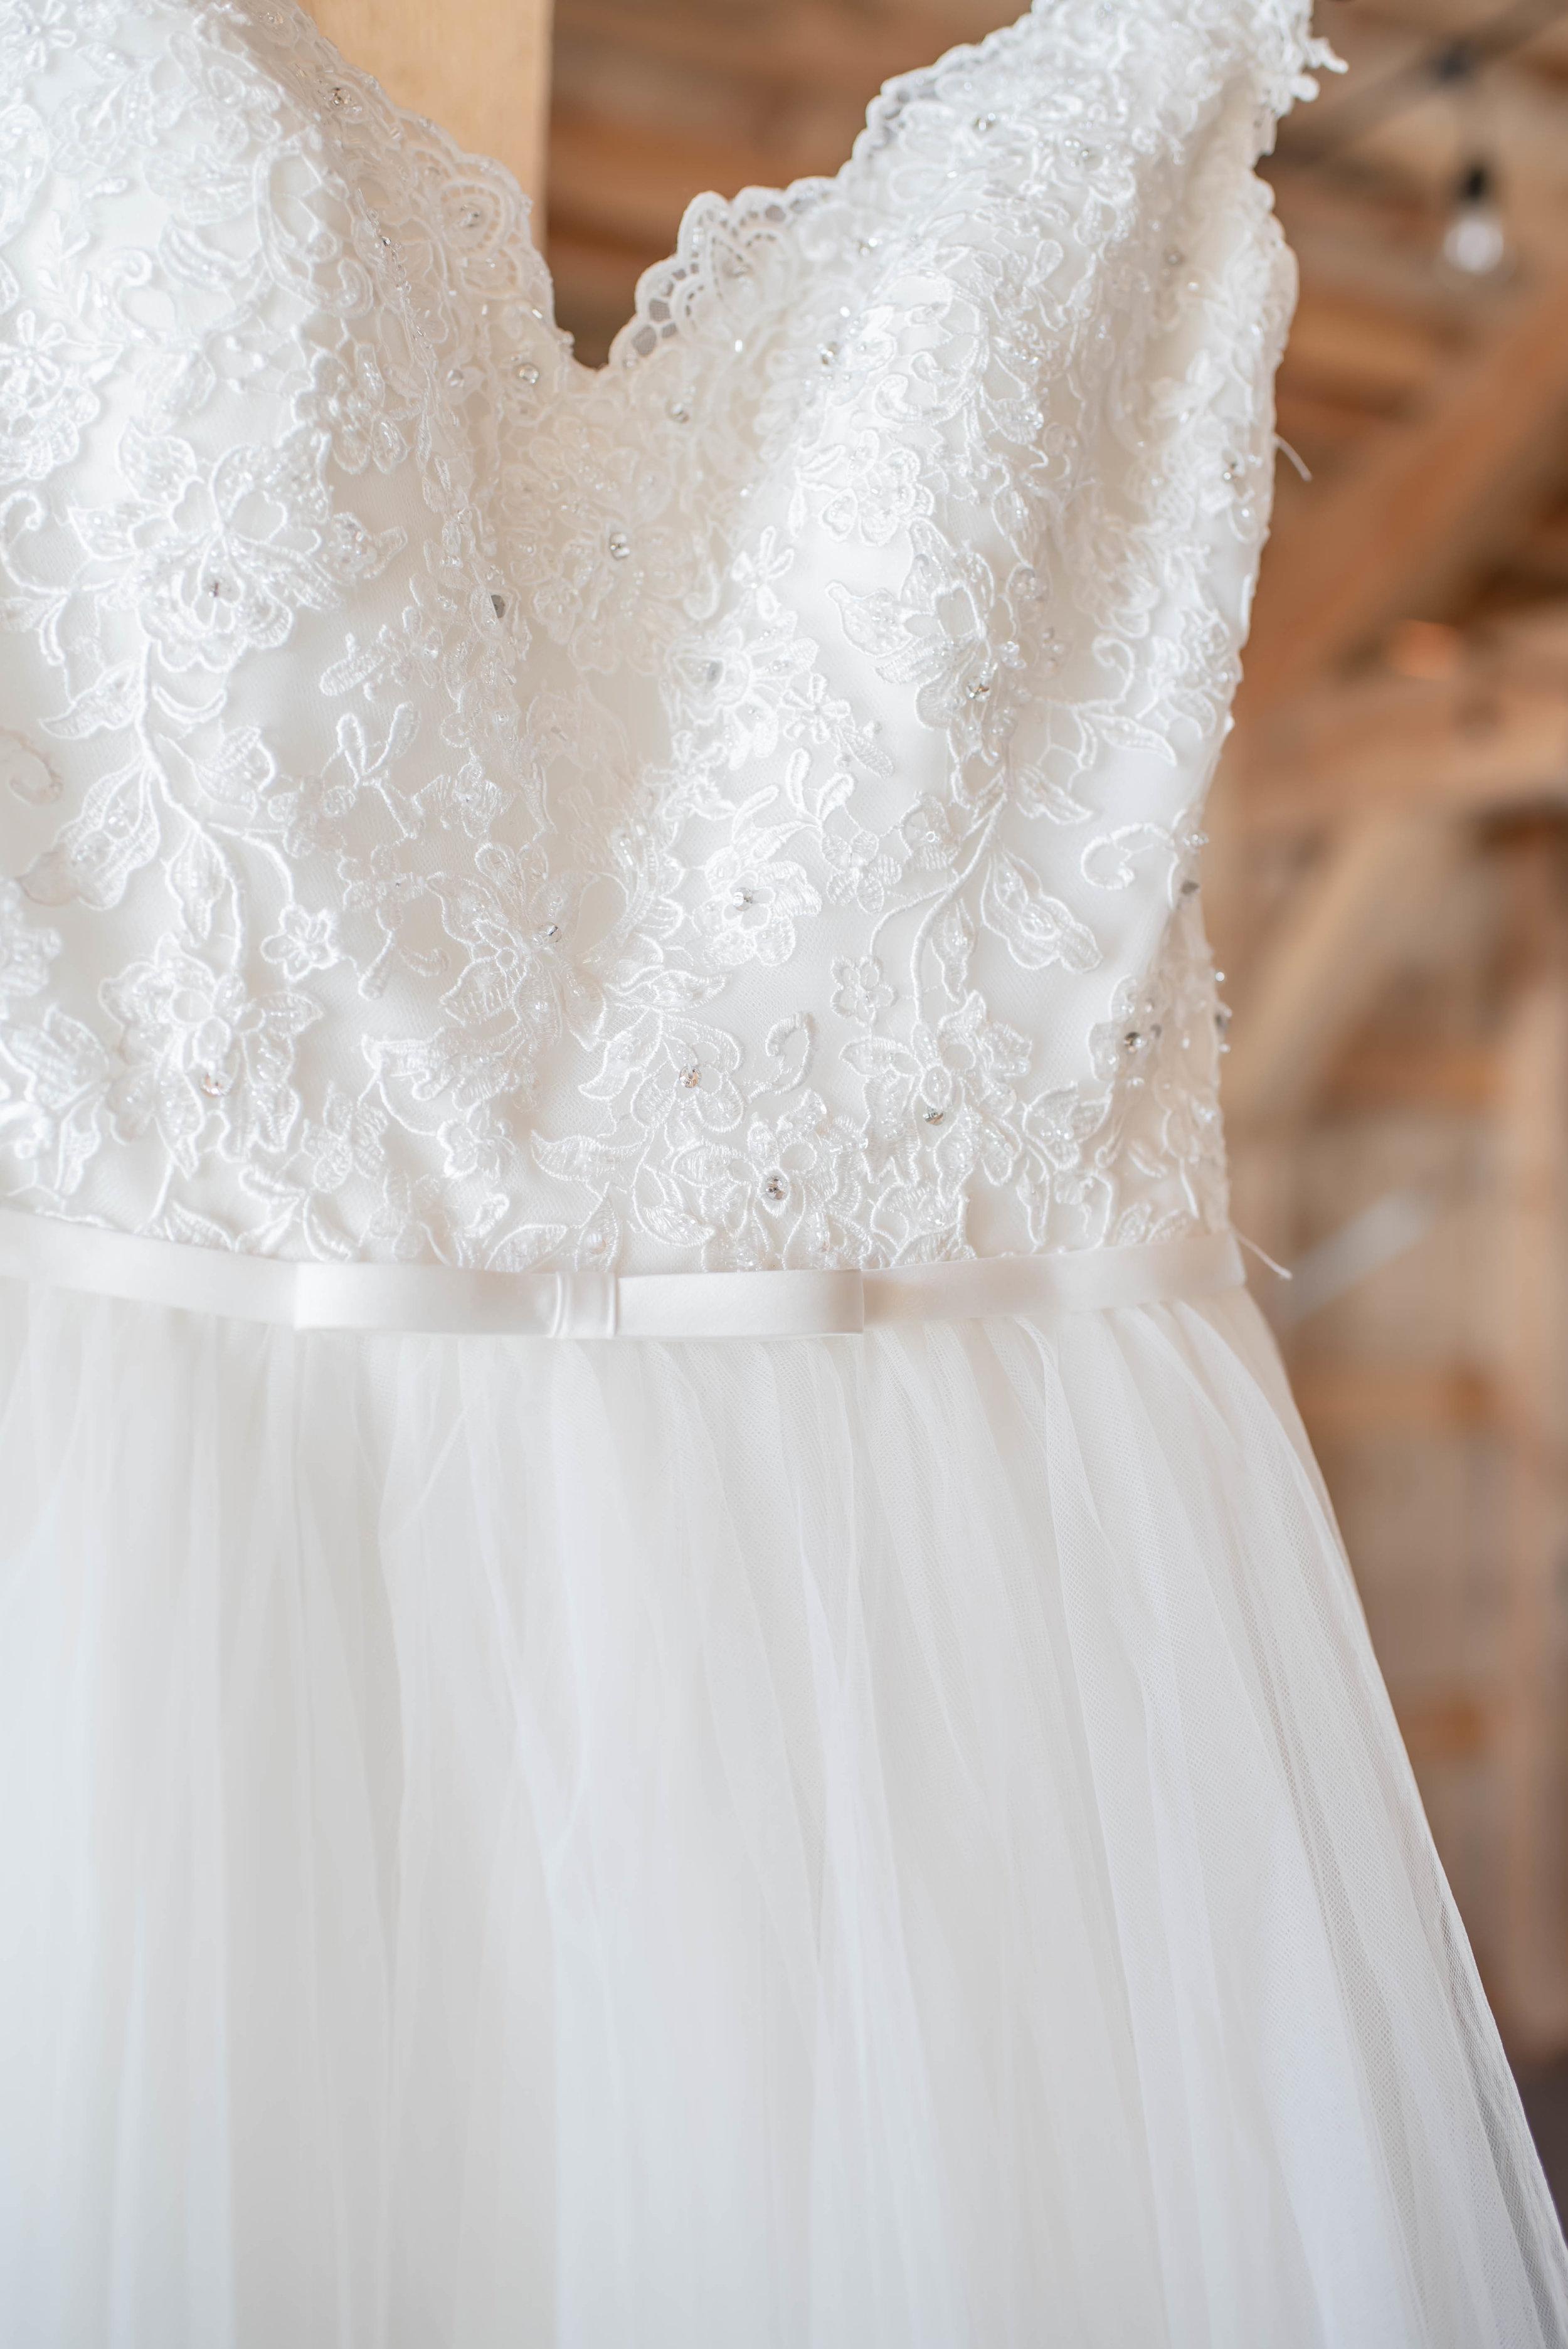 bridal gown close up barn weddings.jpg